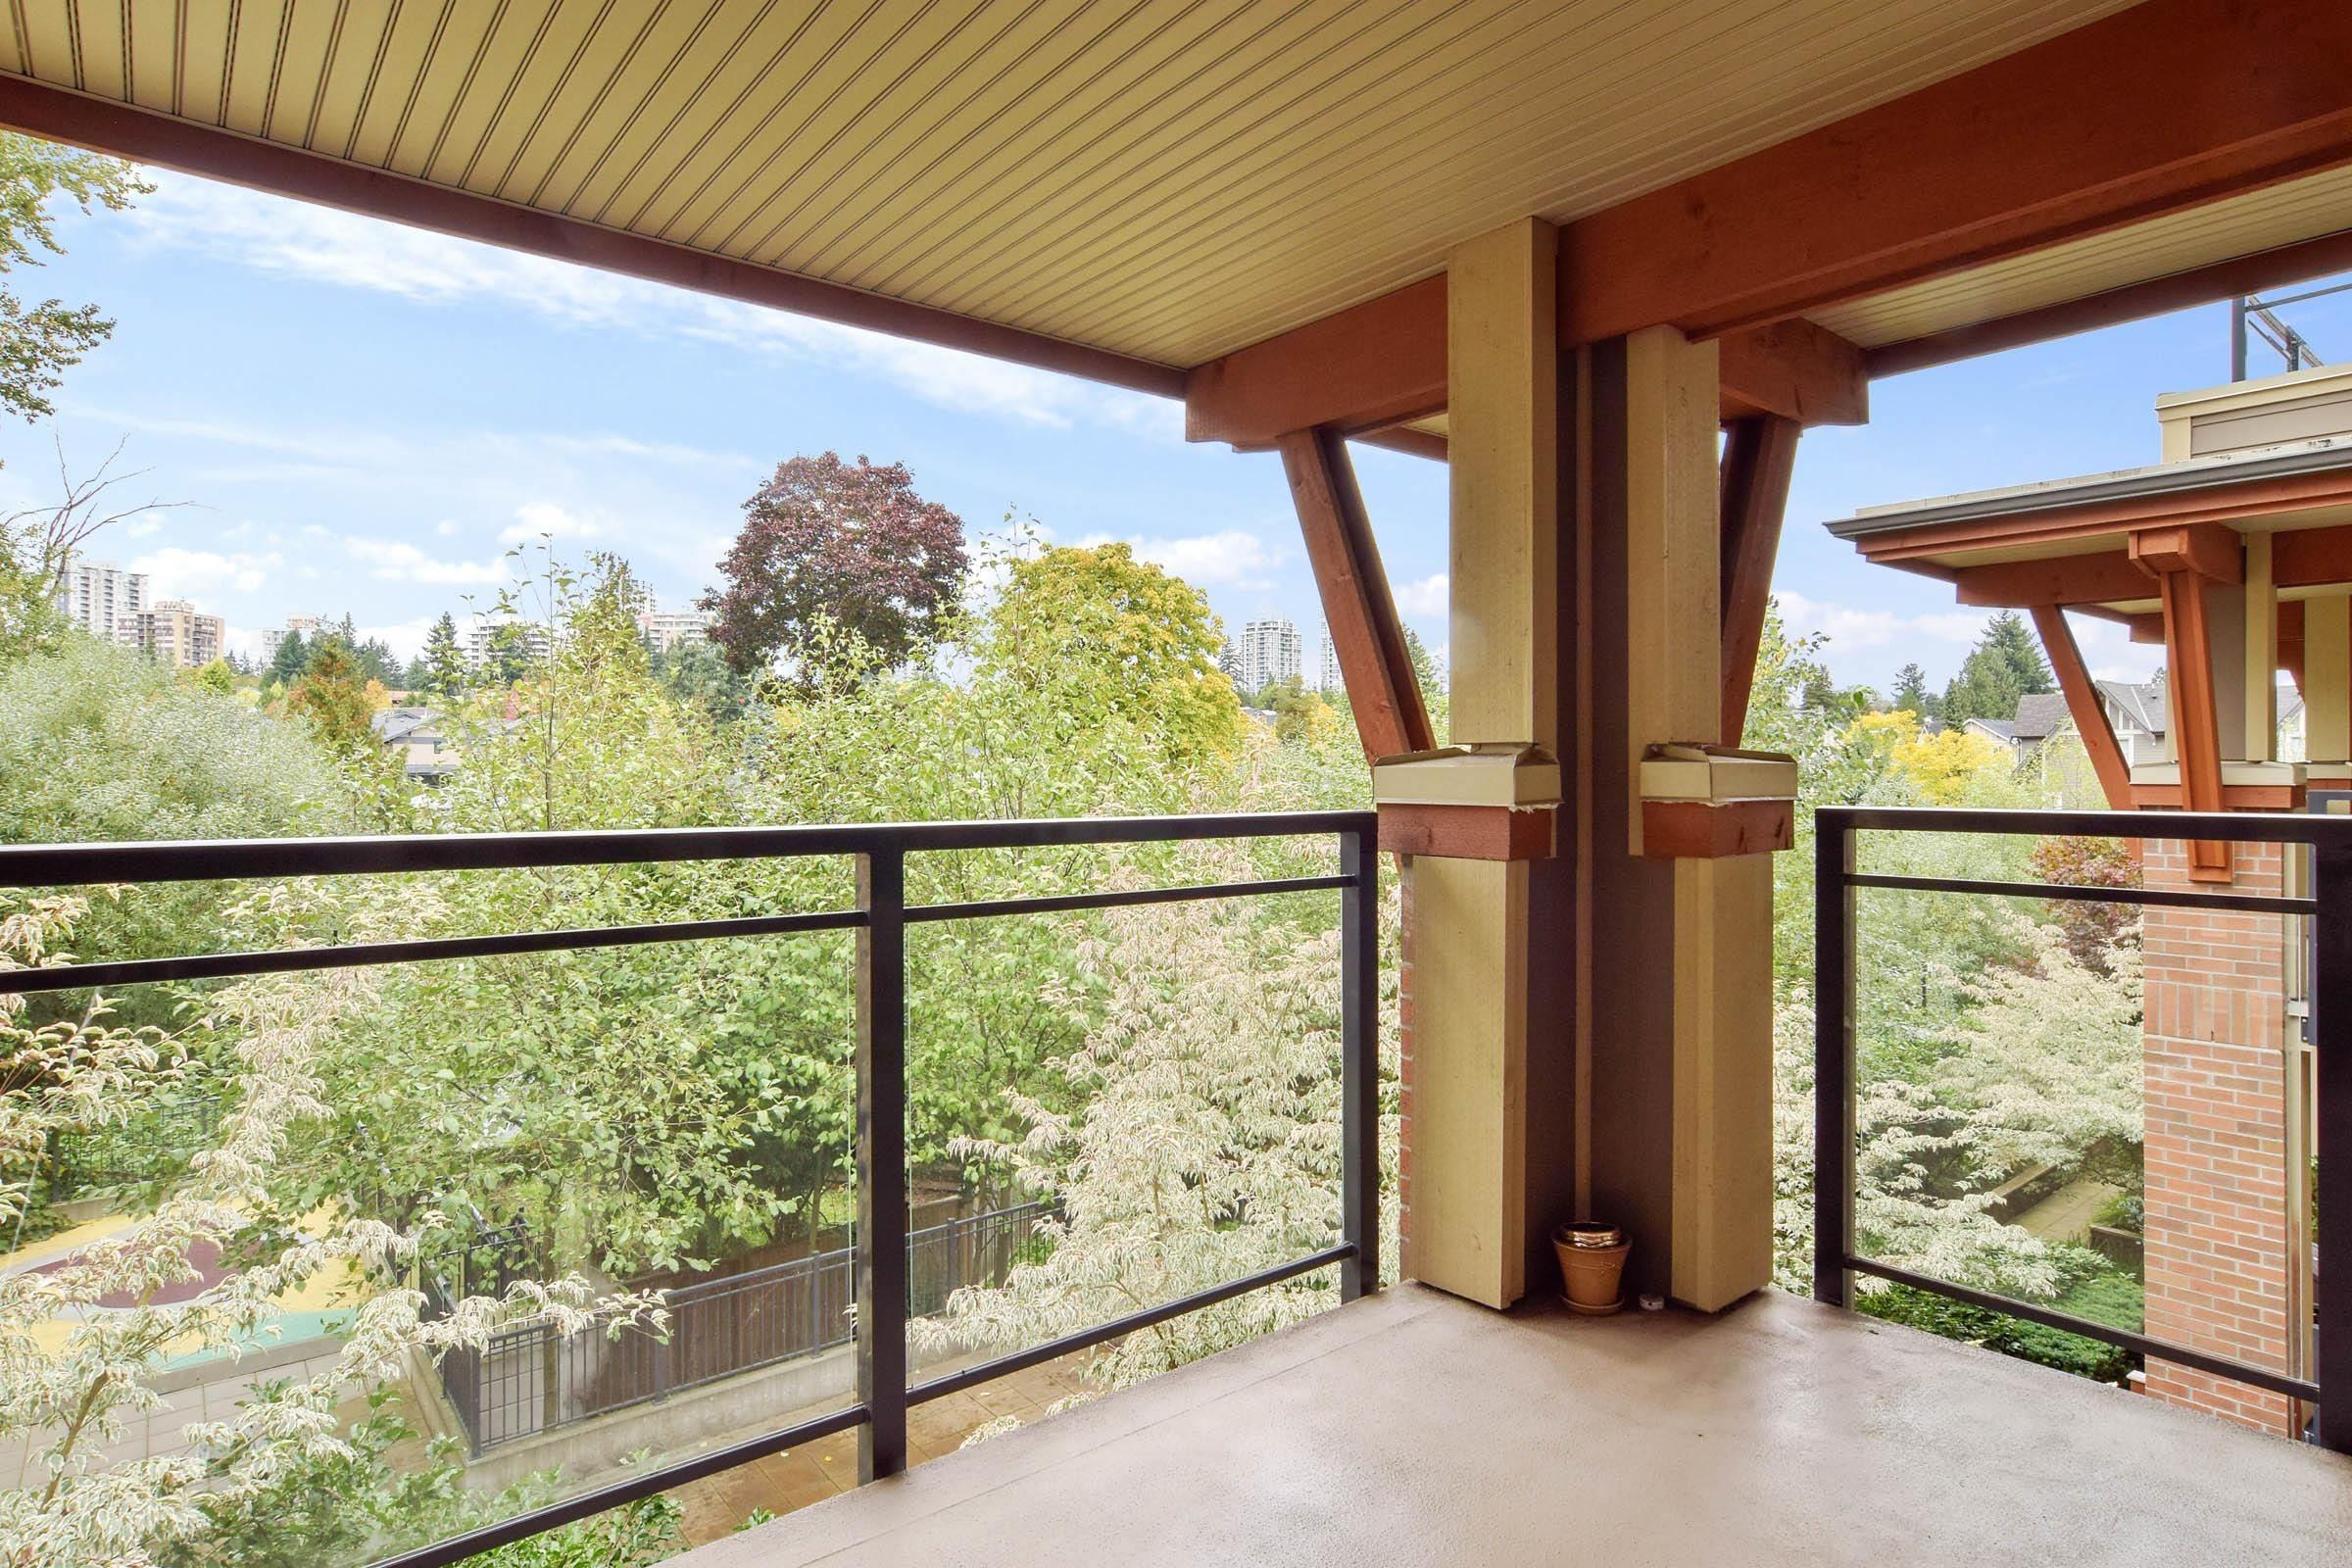 301 7131 STRIDE AVENUE - Edmonds BE Apartment/Condo for sale, 1 Bedroom (R2625669) - #18